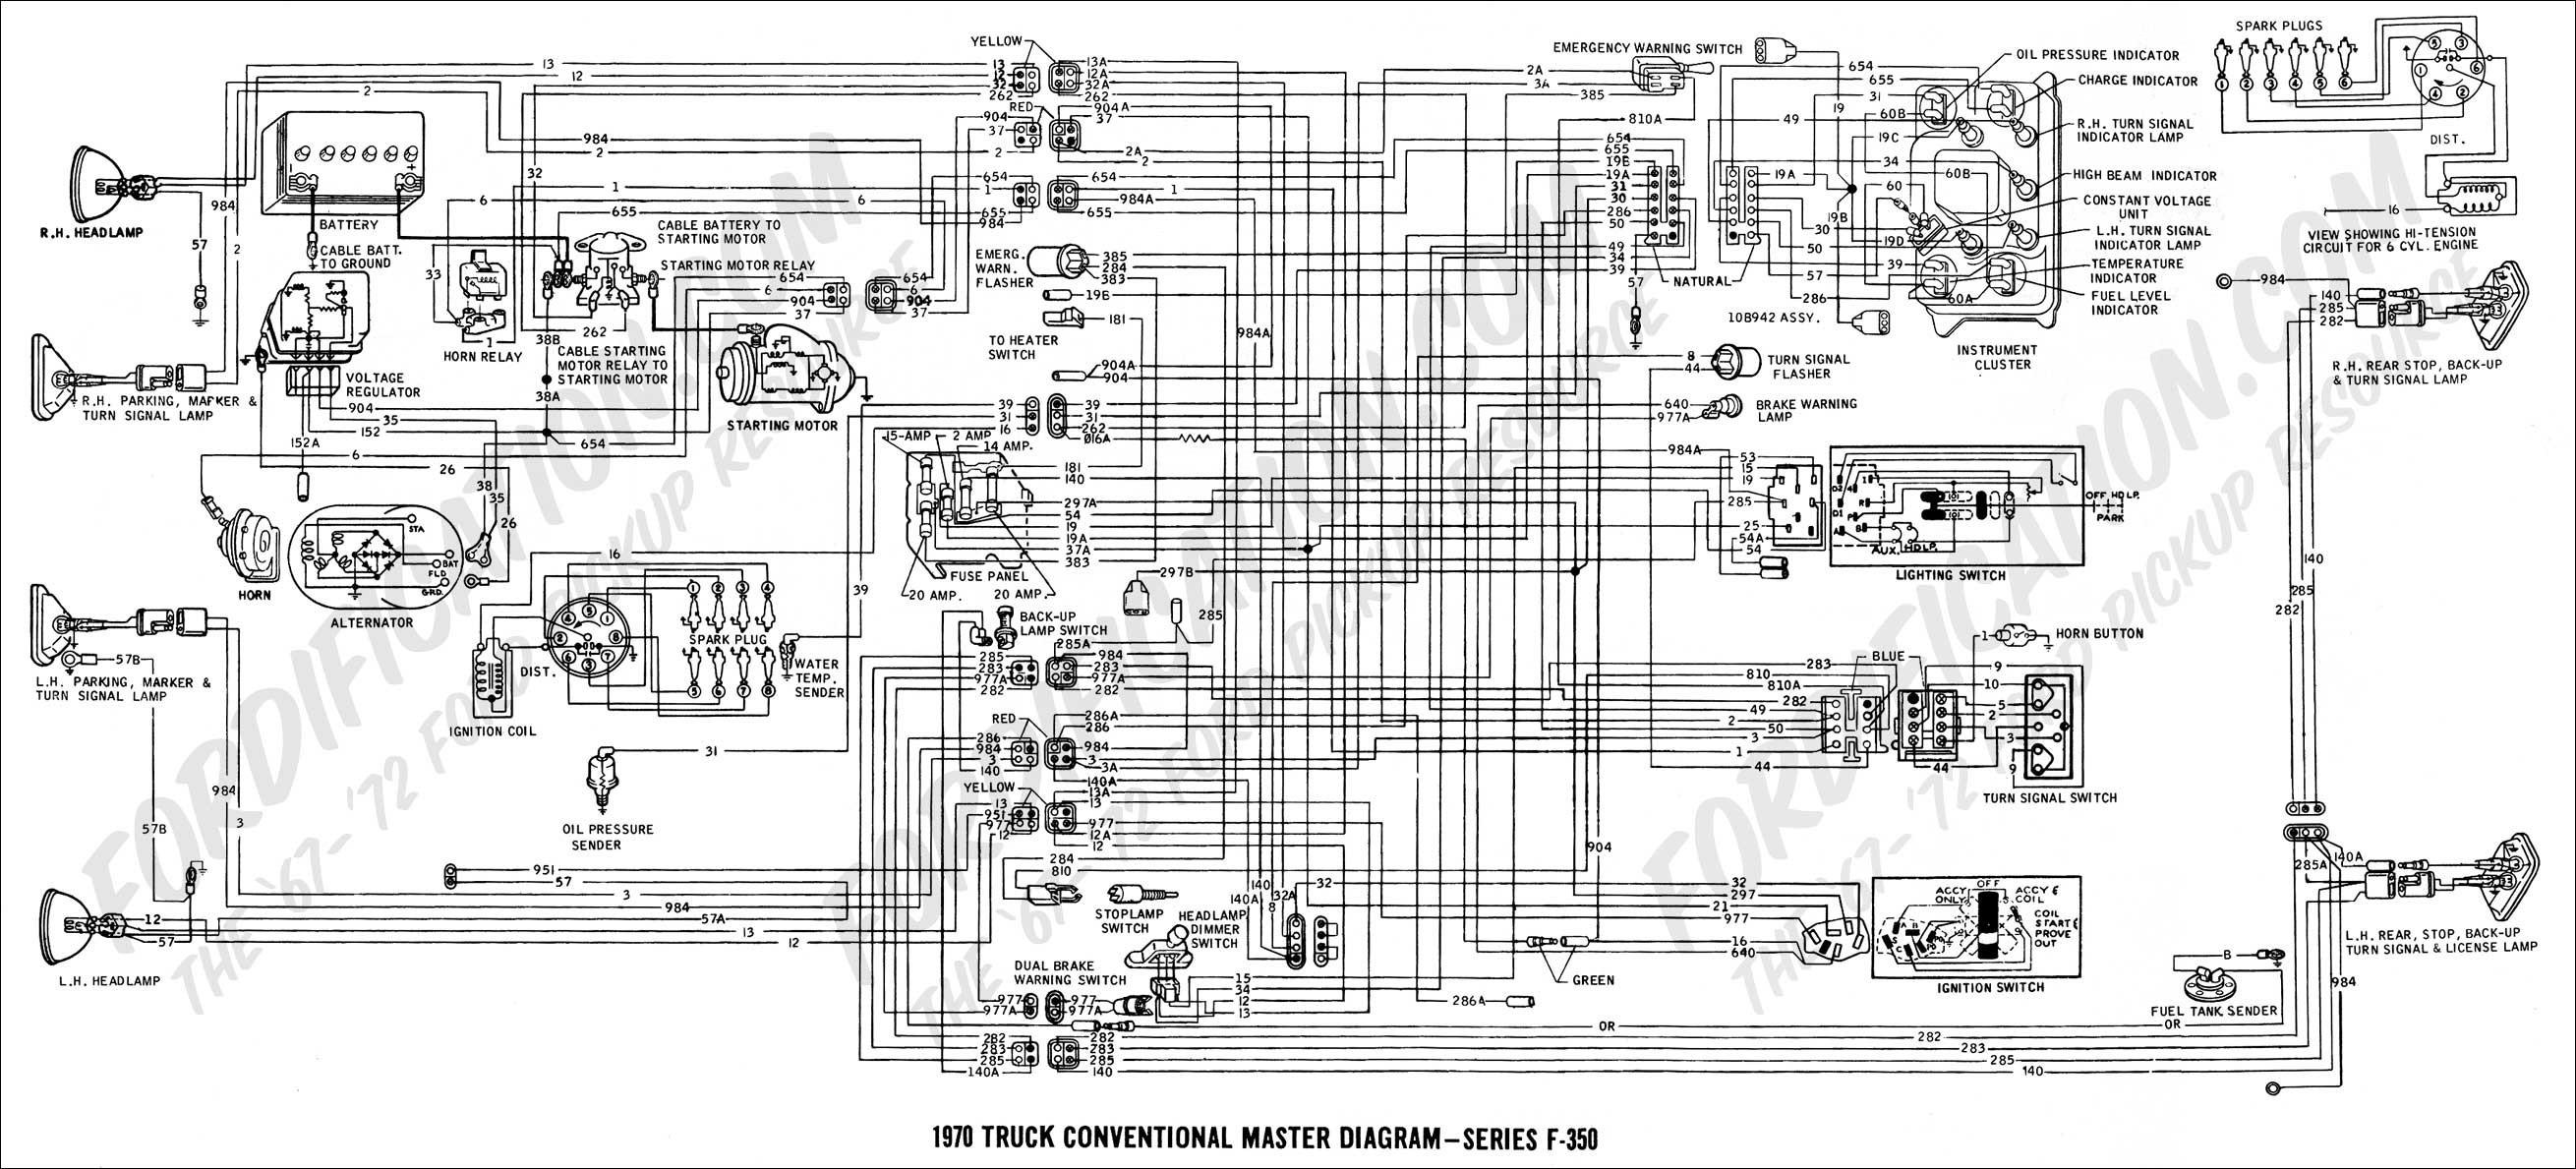 Truck Camper Wiring Diagram Inspirational 240 Volt Wiring Diagram Diagram Of Truck Camper Wiring Diagram